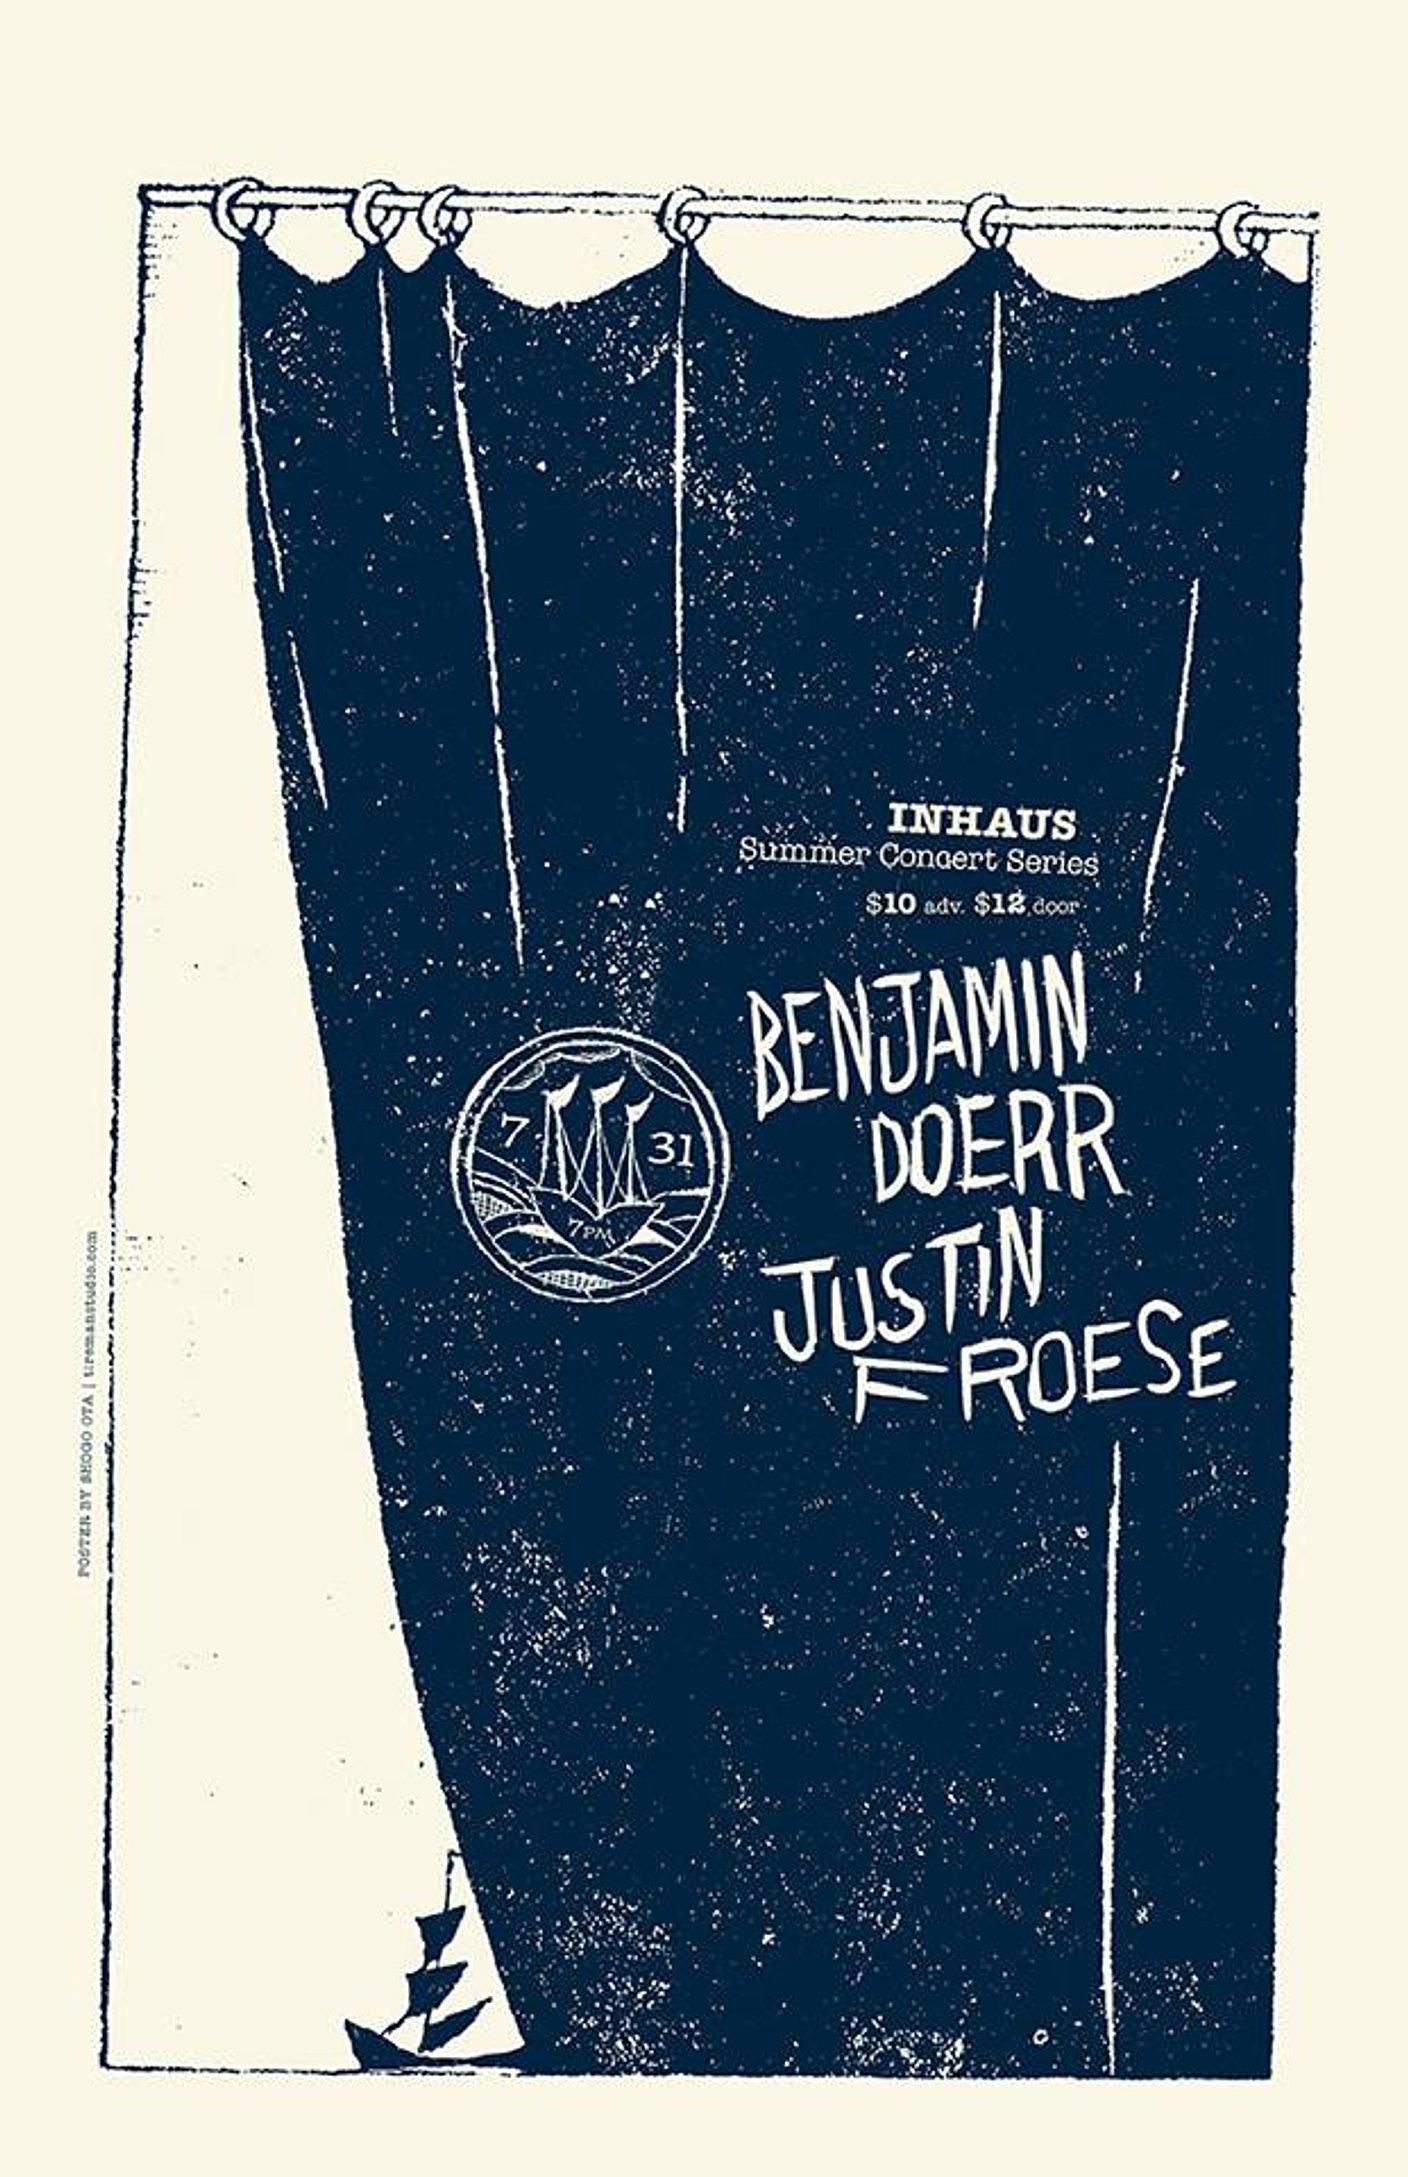 Benjamin Doerr & Justin Froese